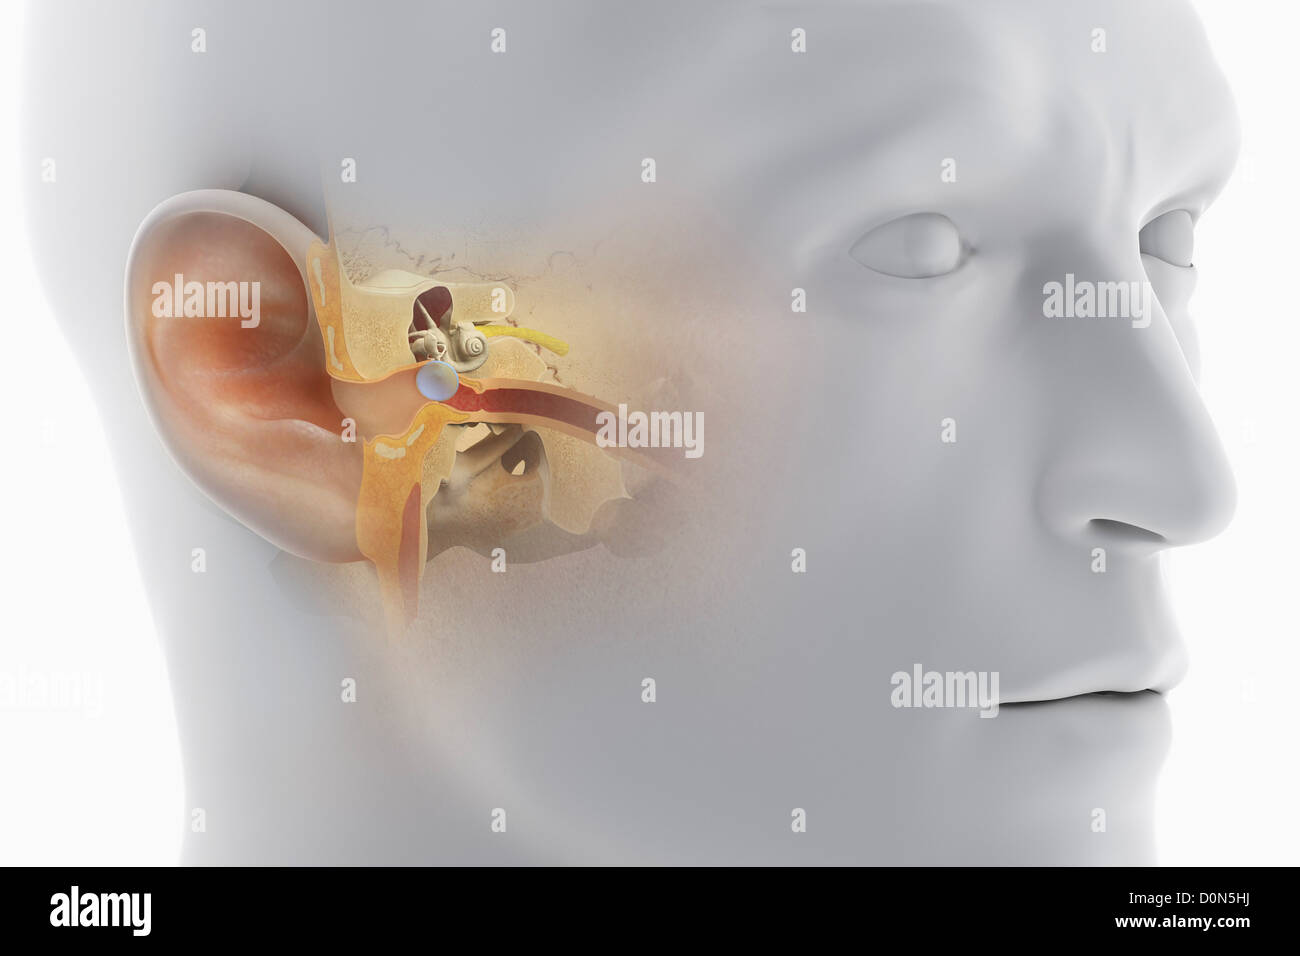 Human inner ear anatomy